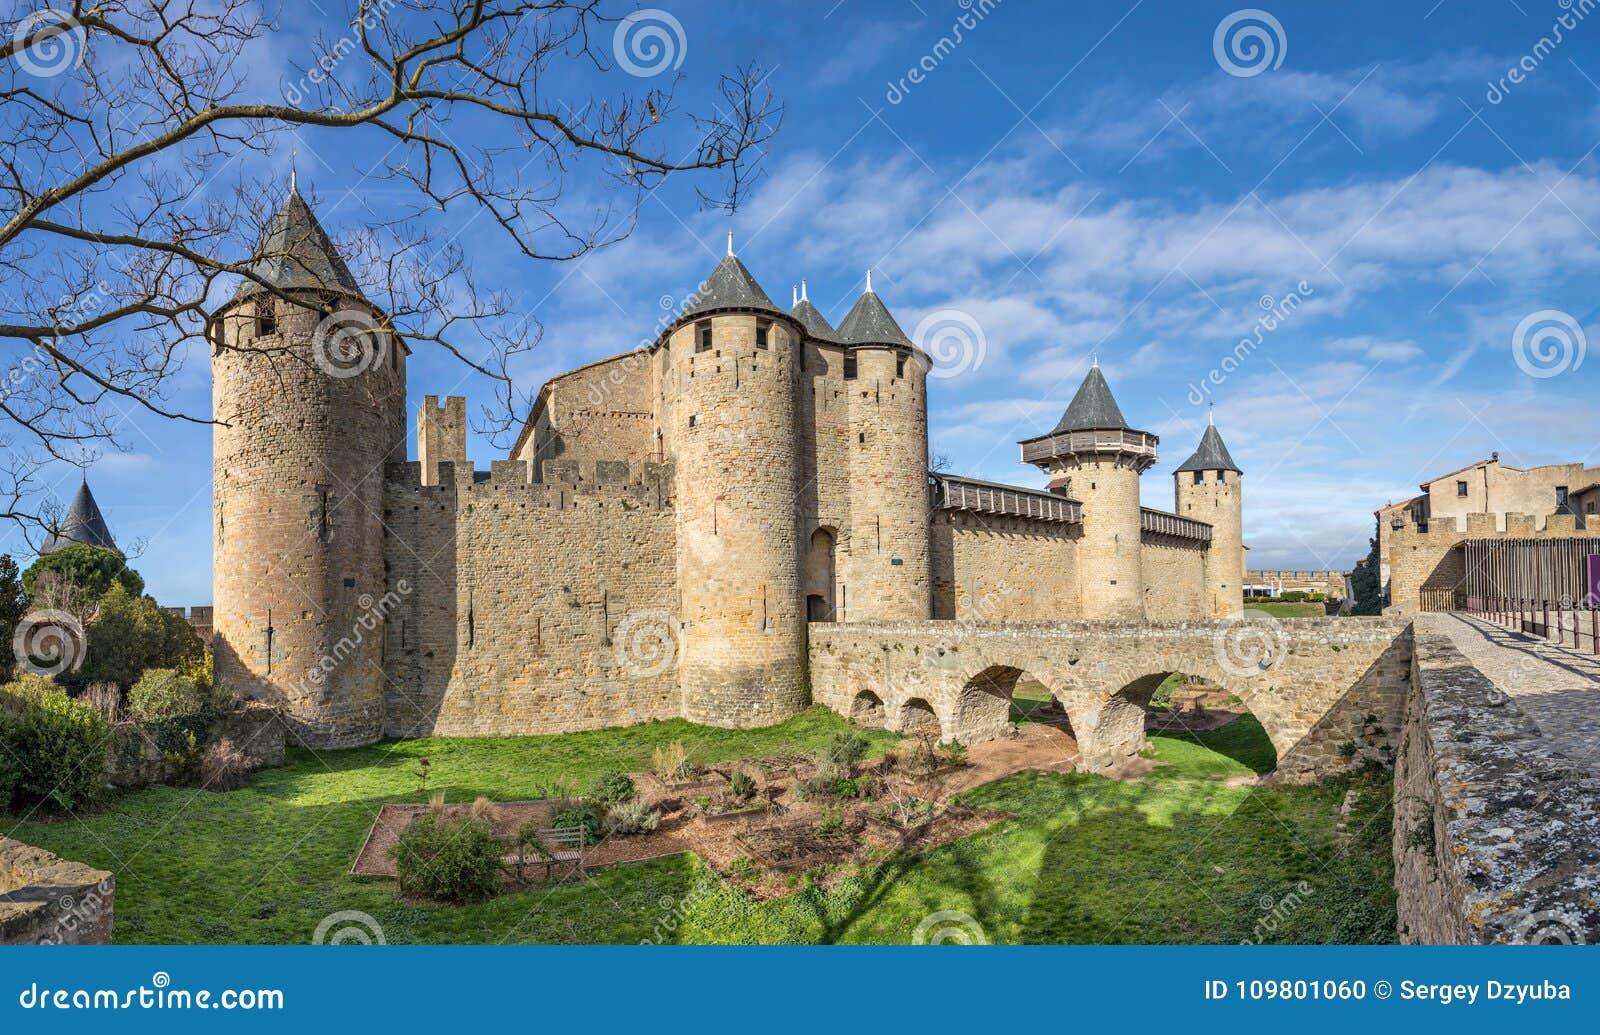 Chateau Comtal - des 12. Jahrhundertsgipfelschloss in Carcassonne